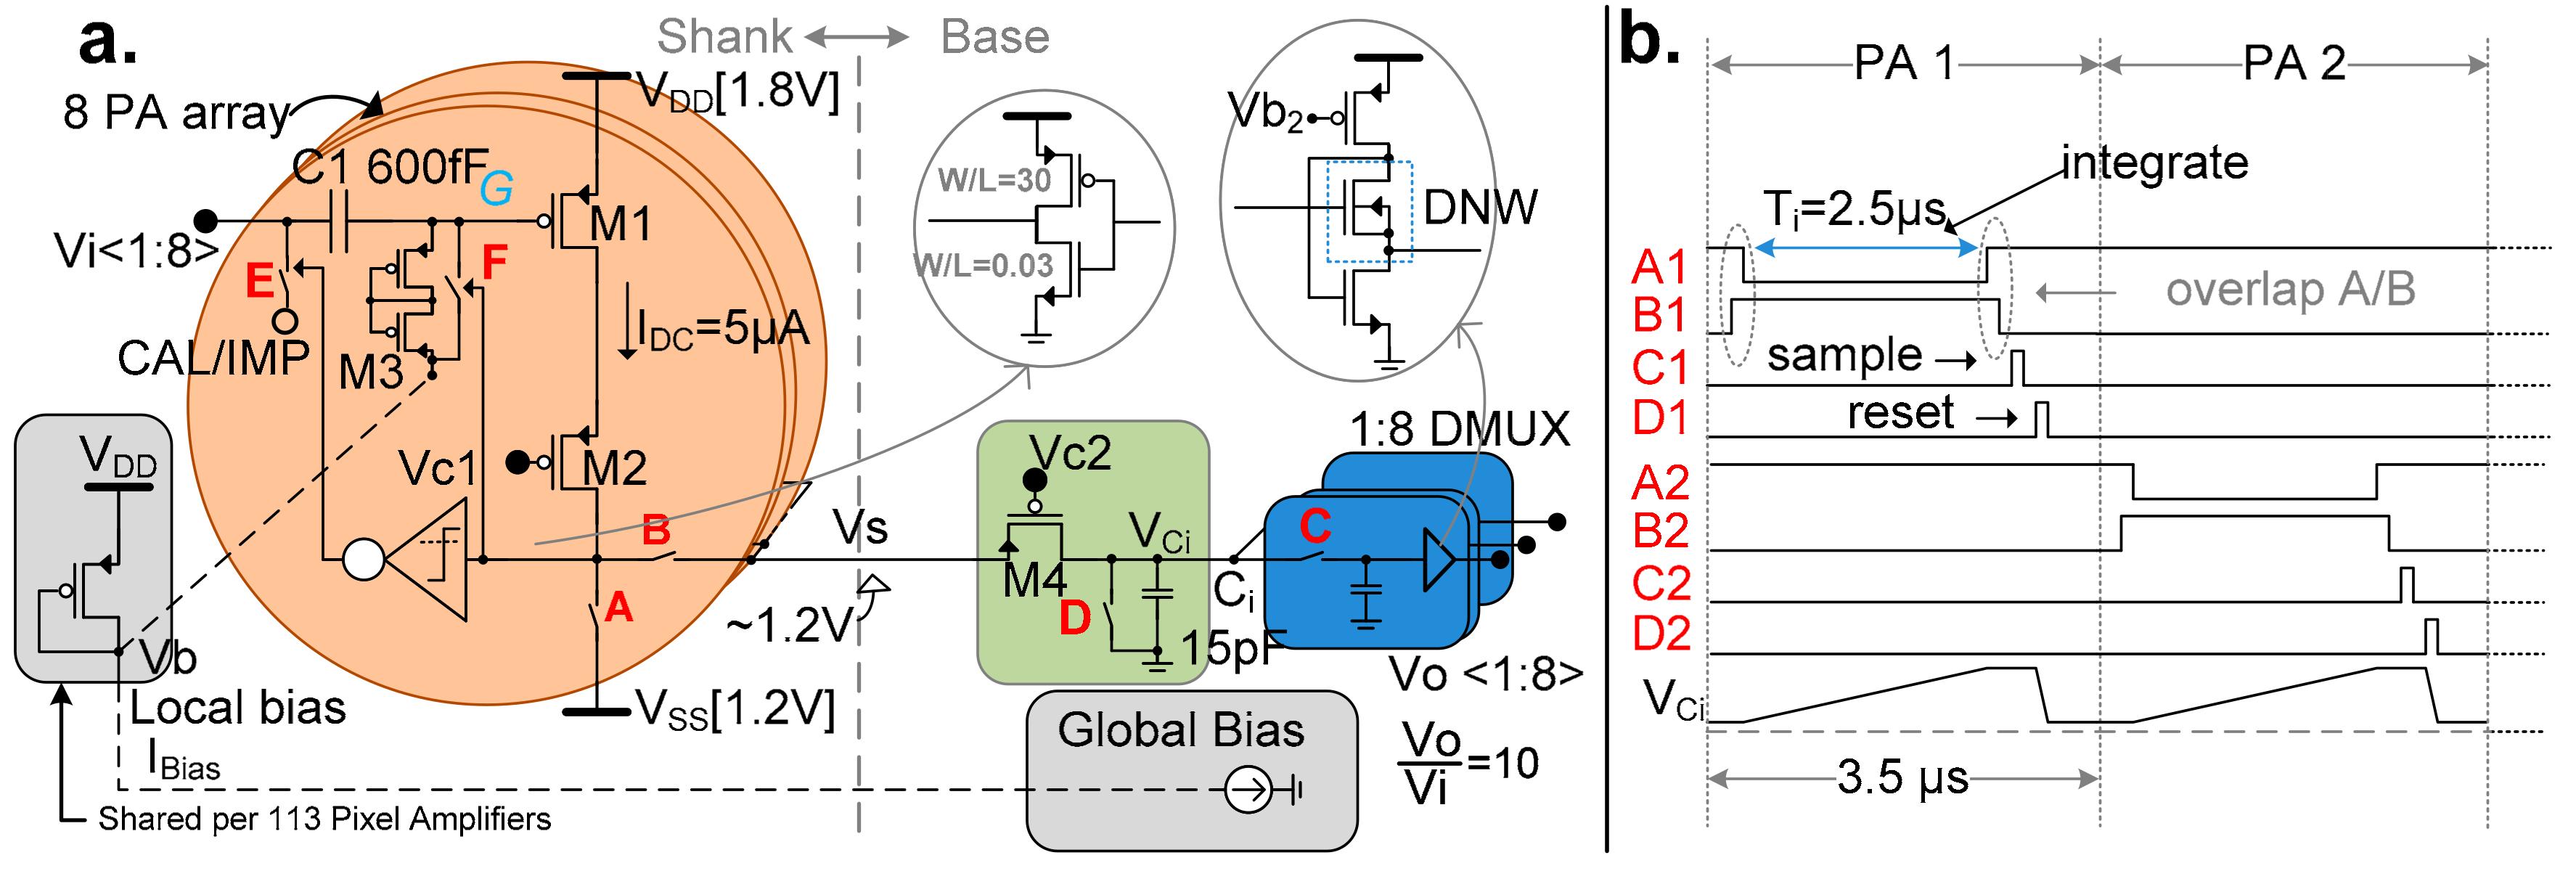 powerboss tss 82 wiring diagrams gmc fuse box diagrams